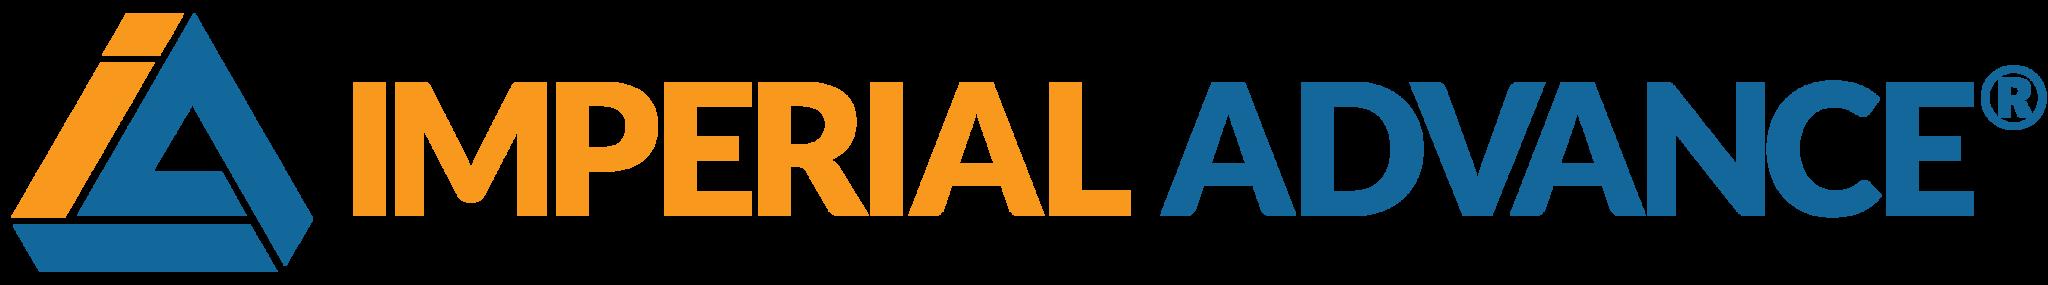 Imperial Advance logo